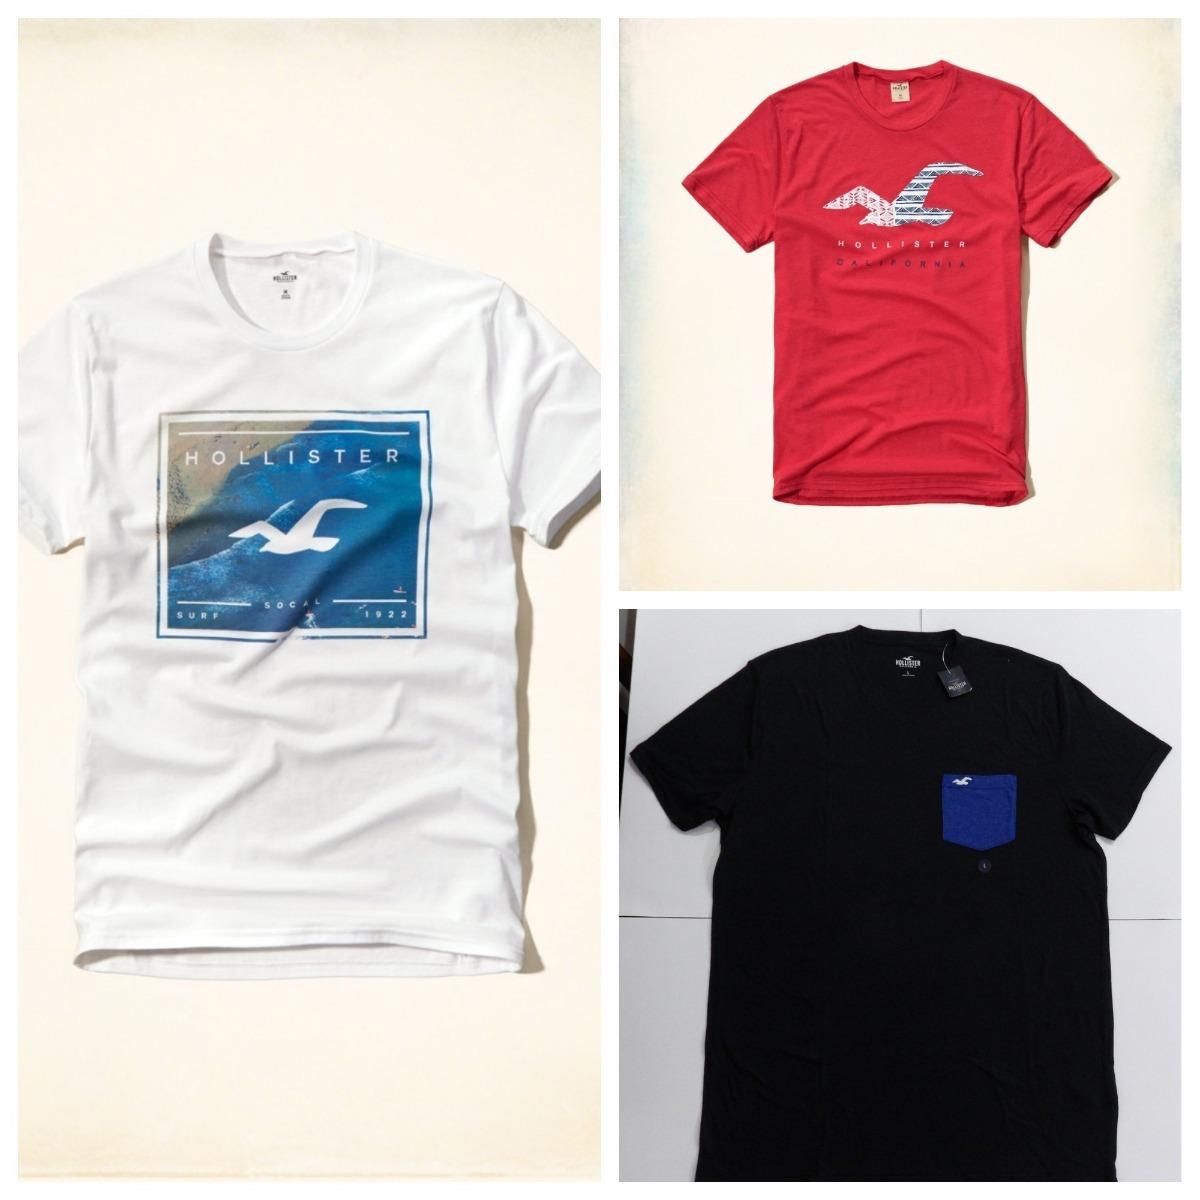 Kit 3 Camisas Camisetas Original Hollister Abercrombie - R  339 63e66419a0763